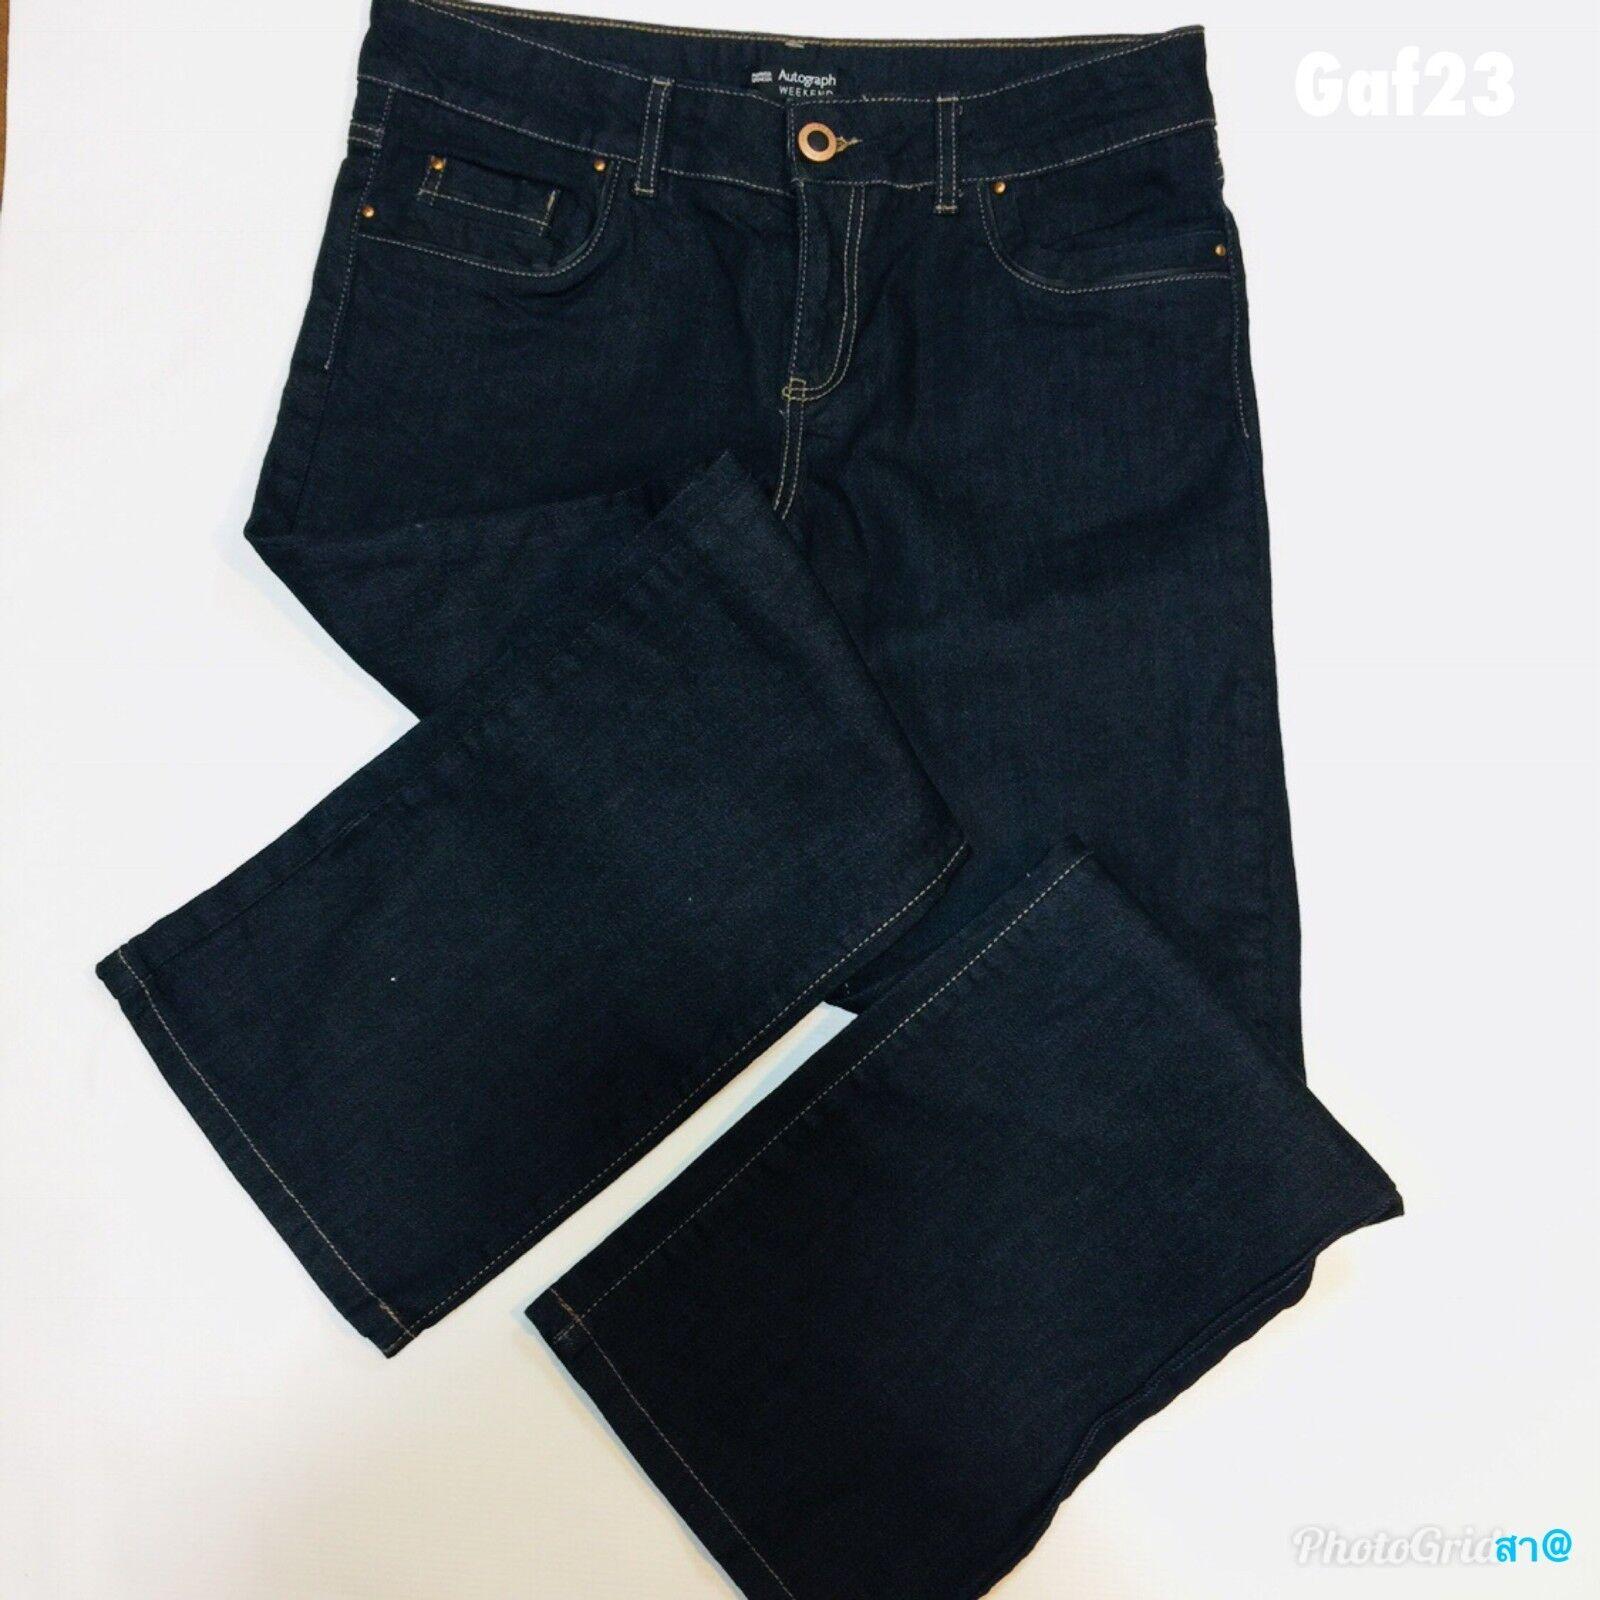 Da Donna And Spencer Weekend Marks AUTOGRAFO Denim Jeans Blu Corto W32 L28